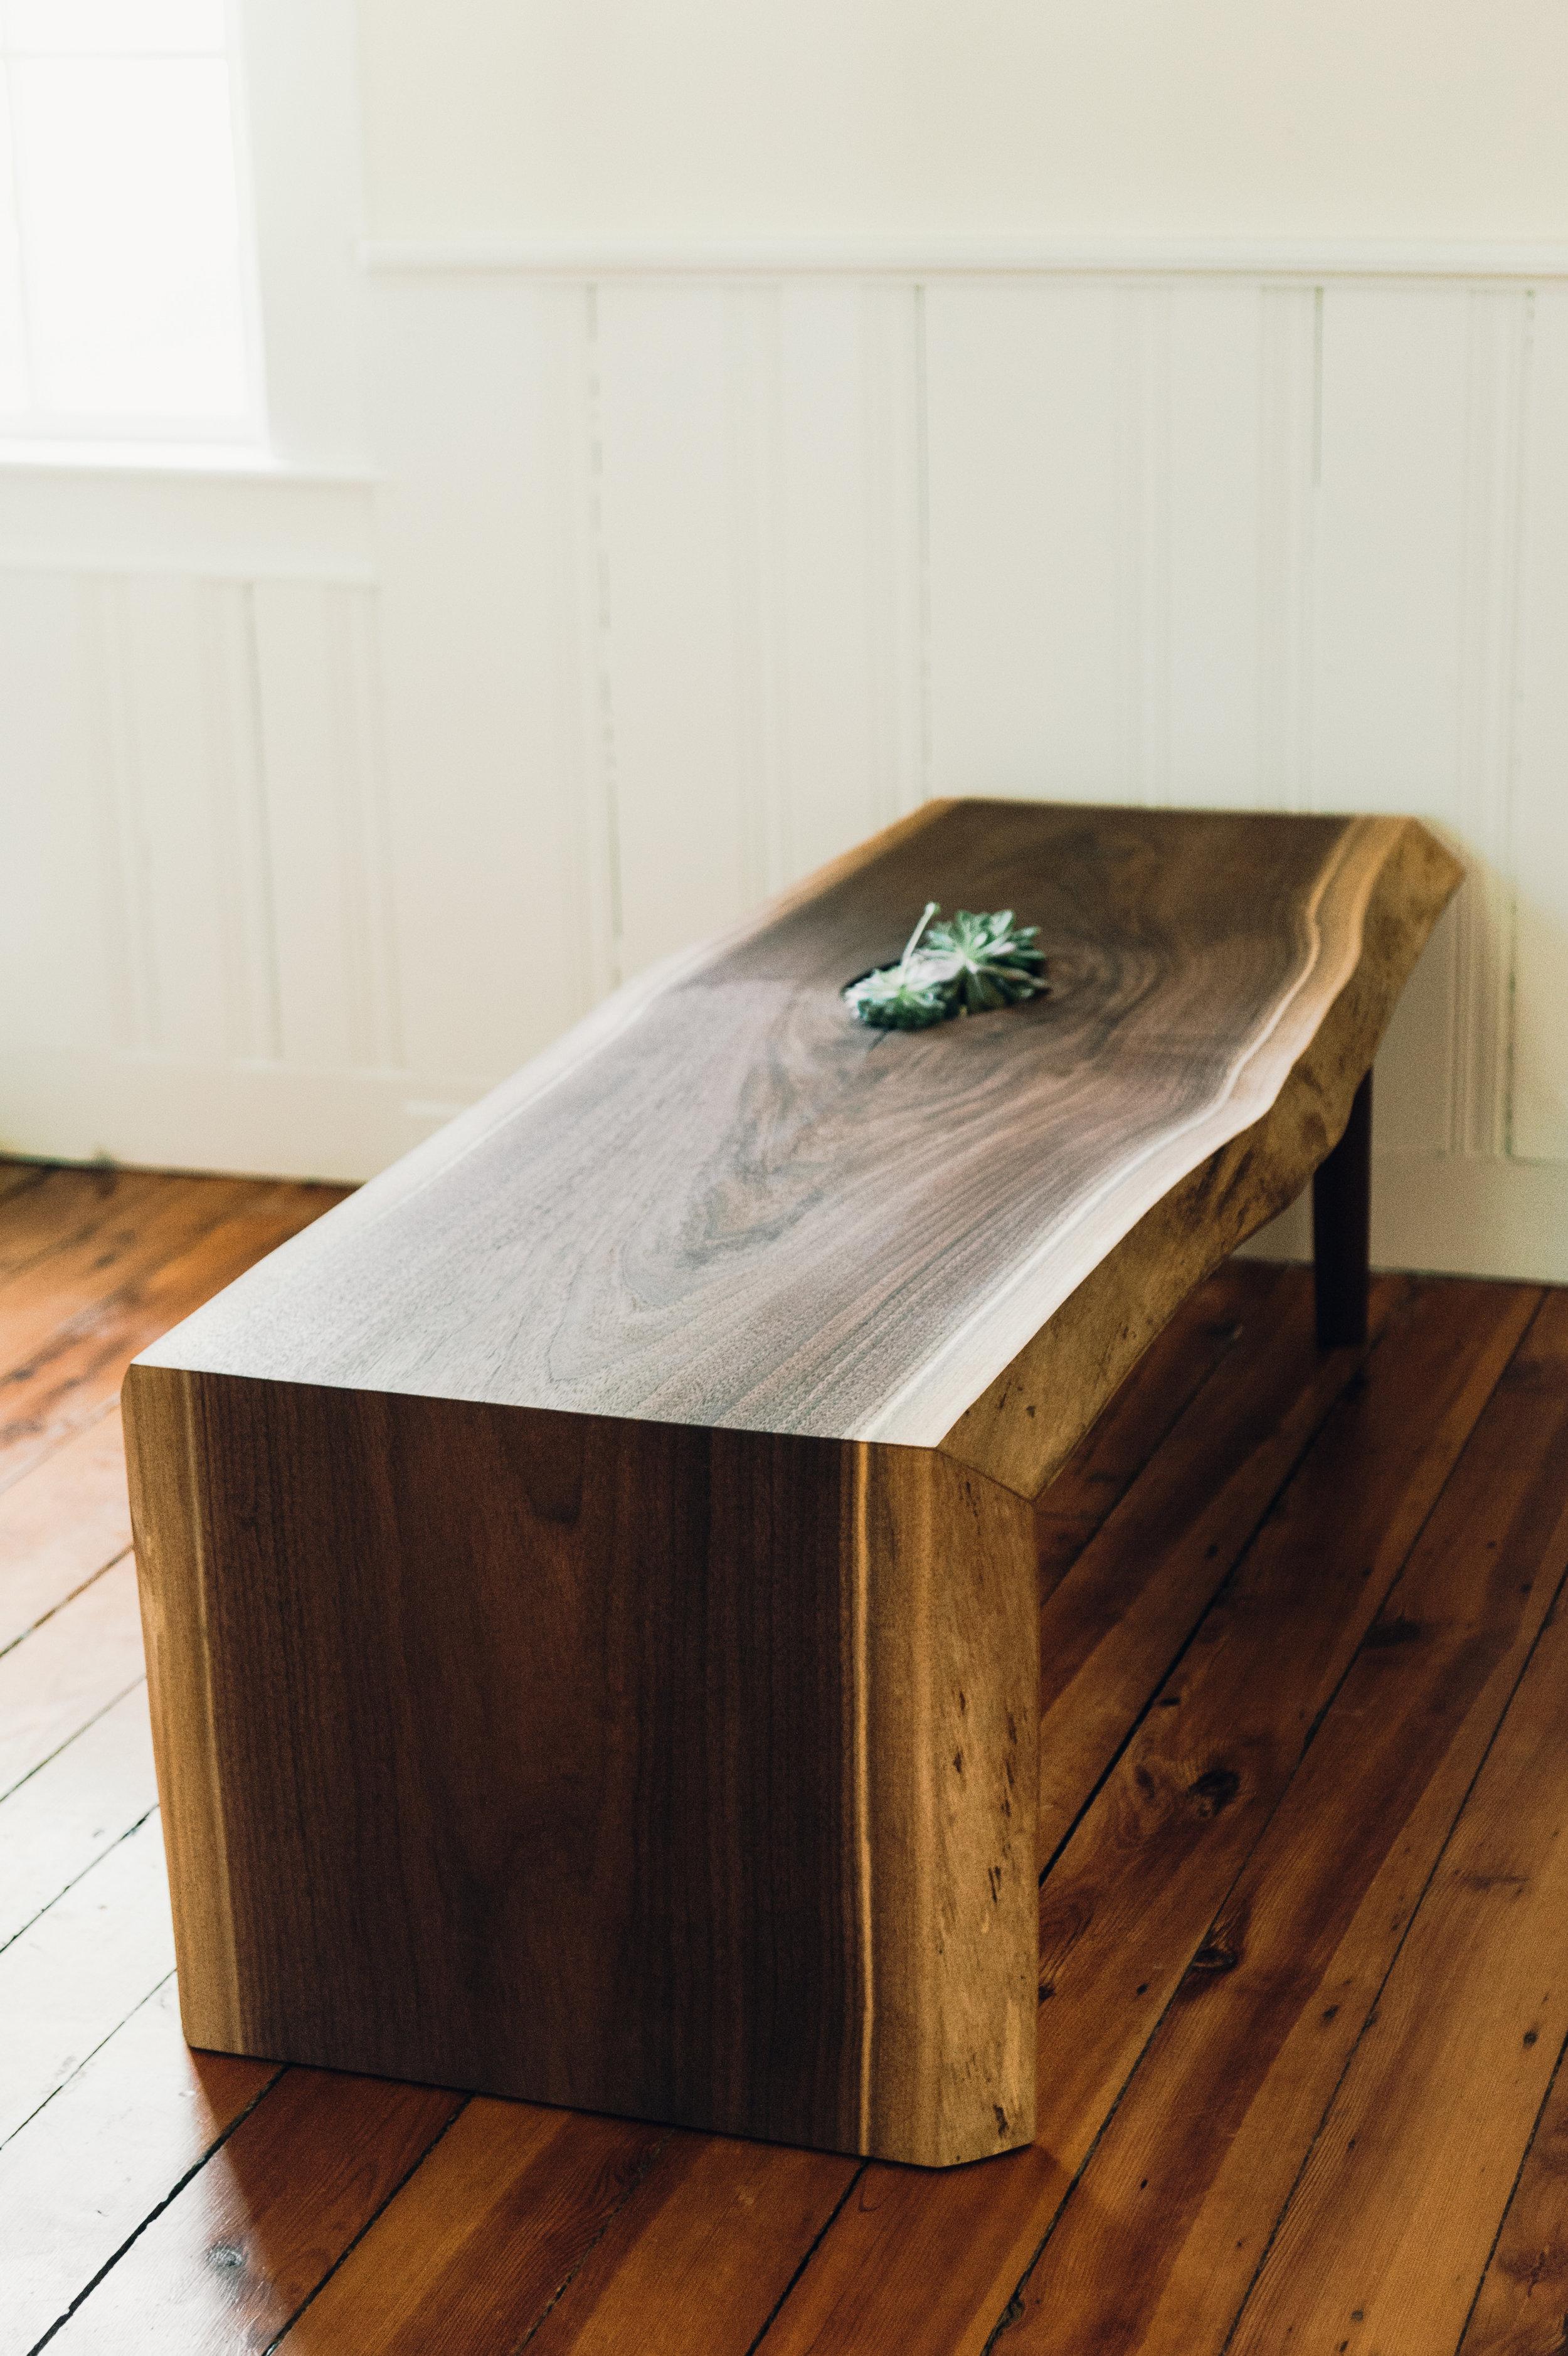 5' Waterfall Coffee Table in Black Walnut